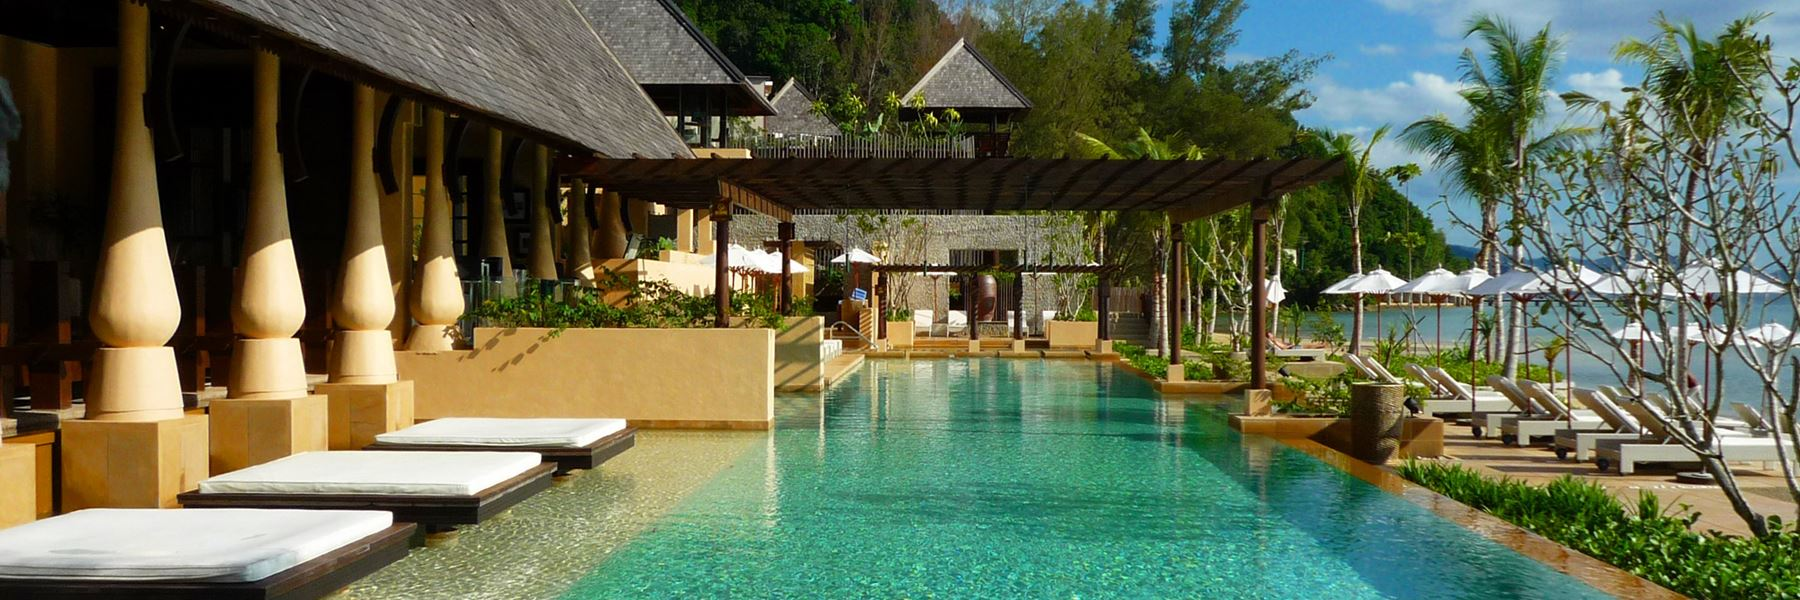 PhotoFly Travel Club   Gaya_Island_Resort_Gaya_Island_509930   PhotoFly Travel Club